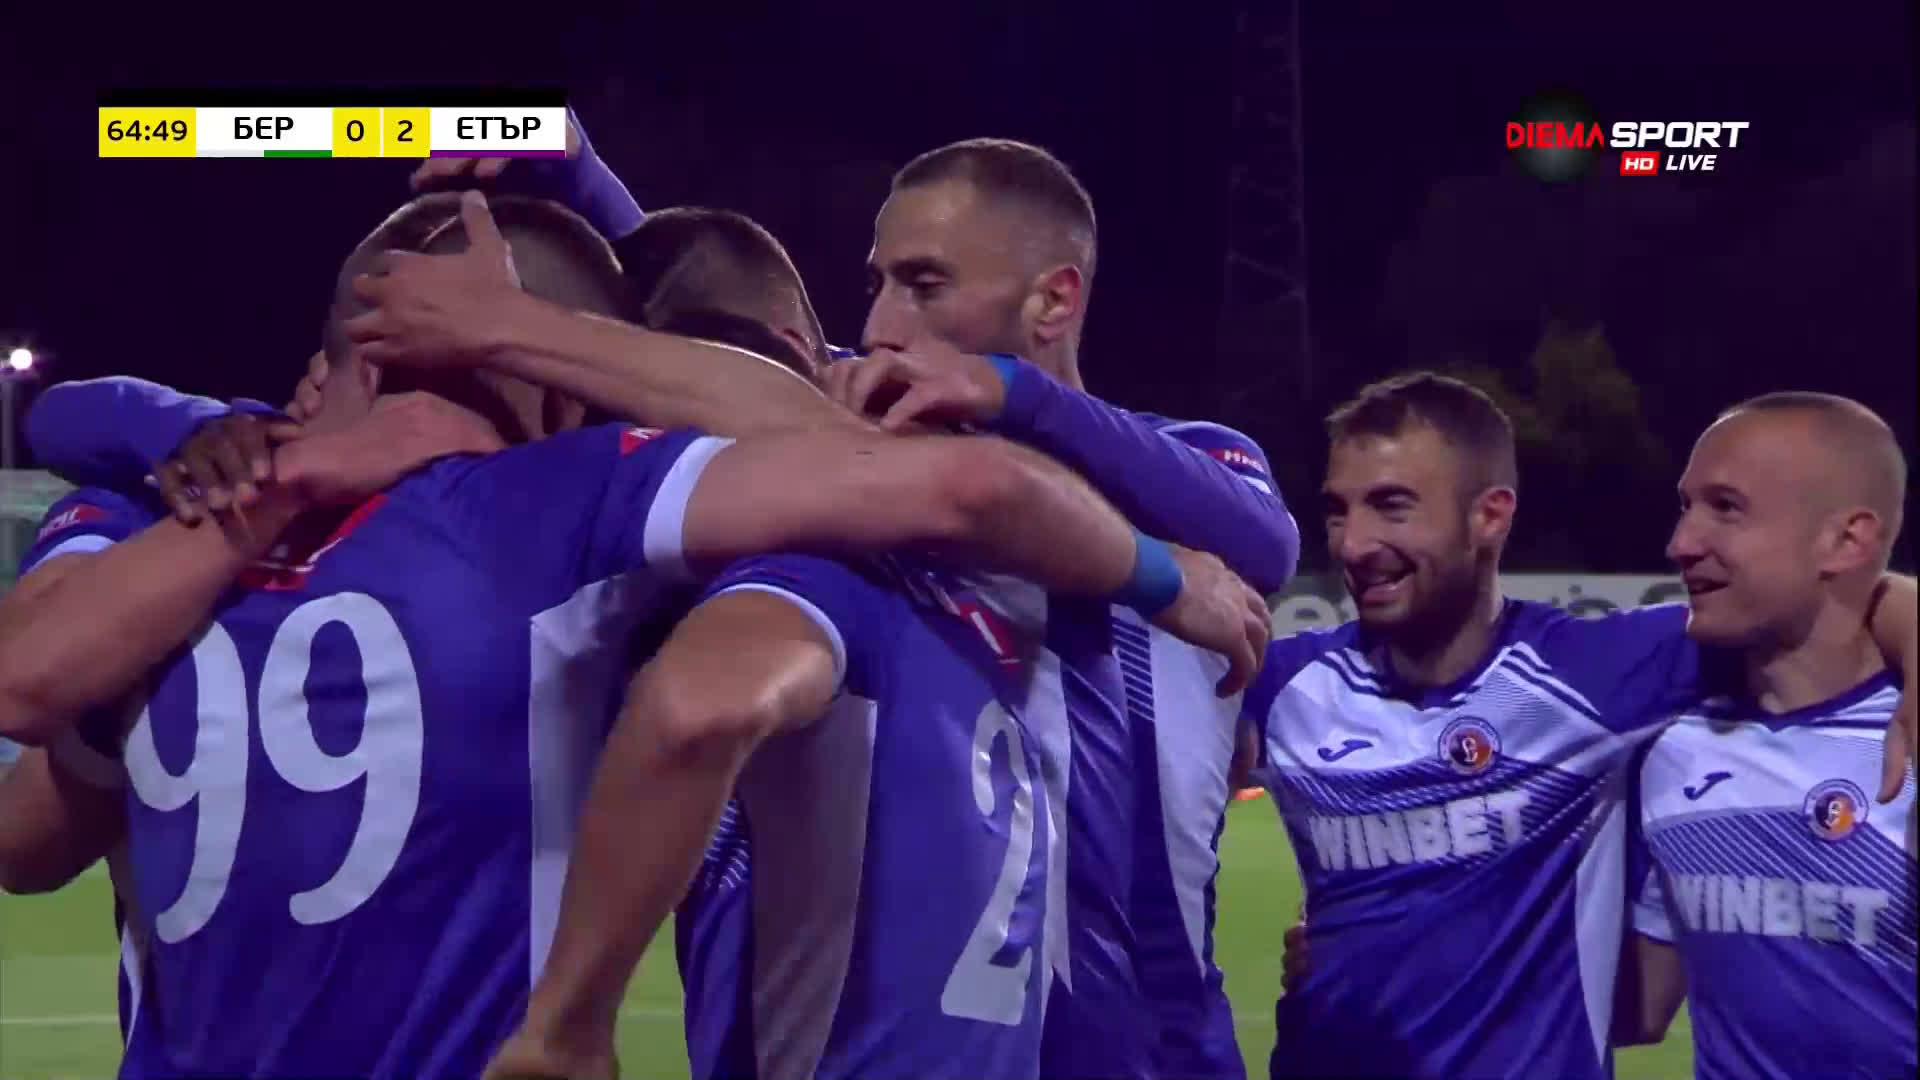 Боруков няма спирка, заши втори гол